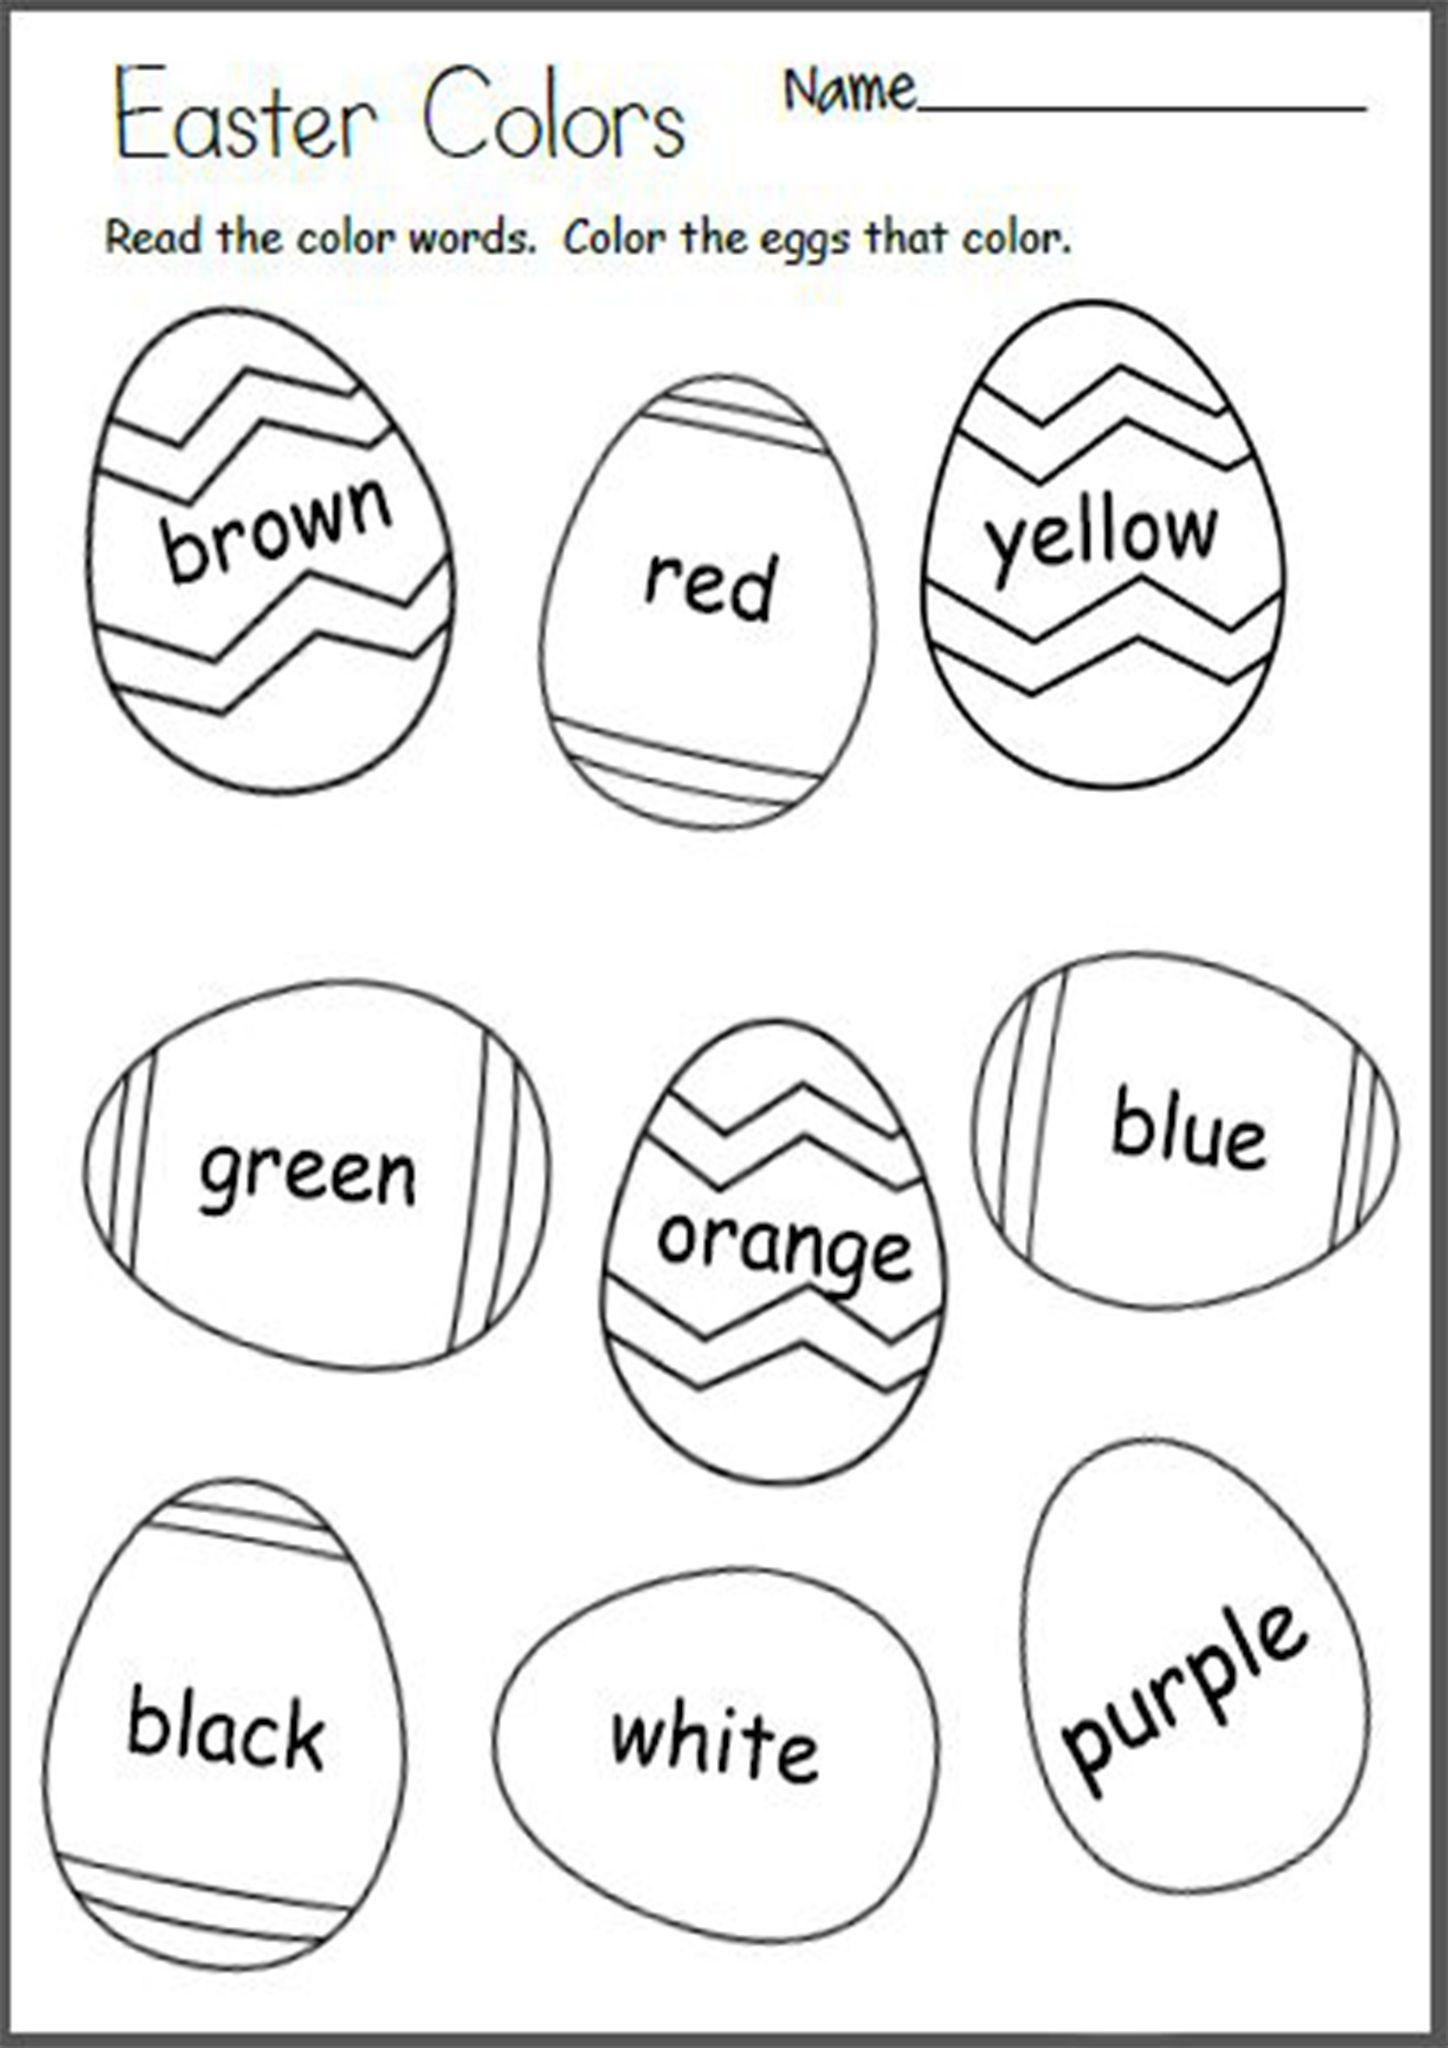 Free Printable Easter Worksheets For Little Ones In 2020 Easter Preschool Worksheets Easter Worksheets Easter Kindergarten